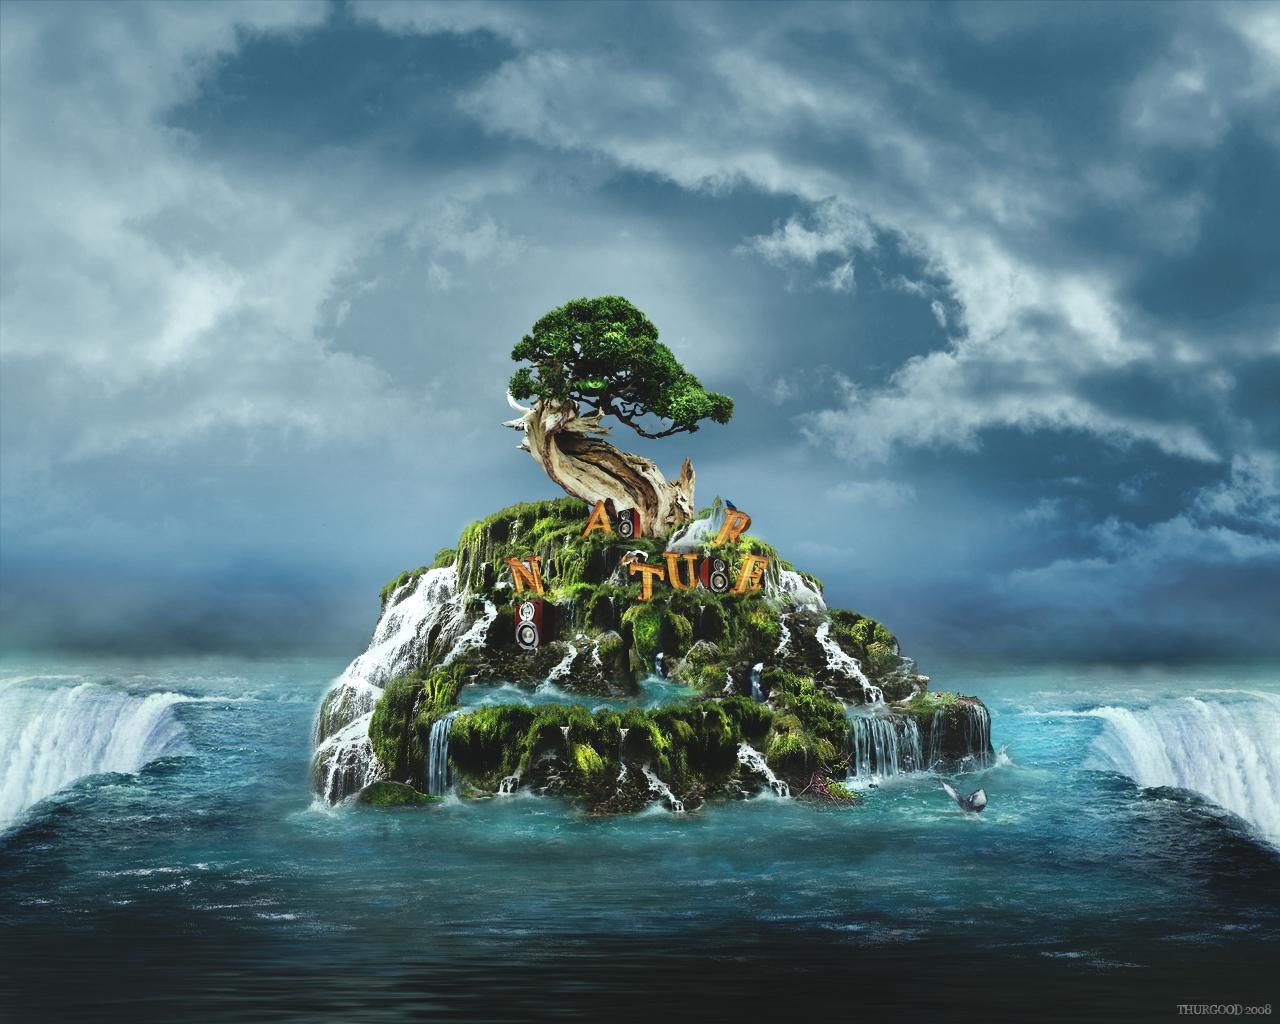 13 Fantastic Nature Wallpapers Undergone Photo Manipulation 1280x1024